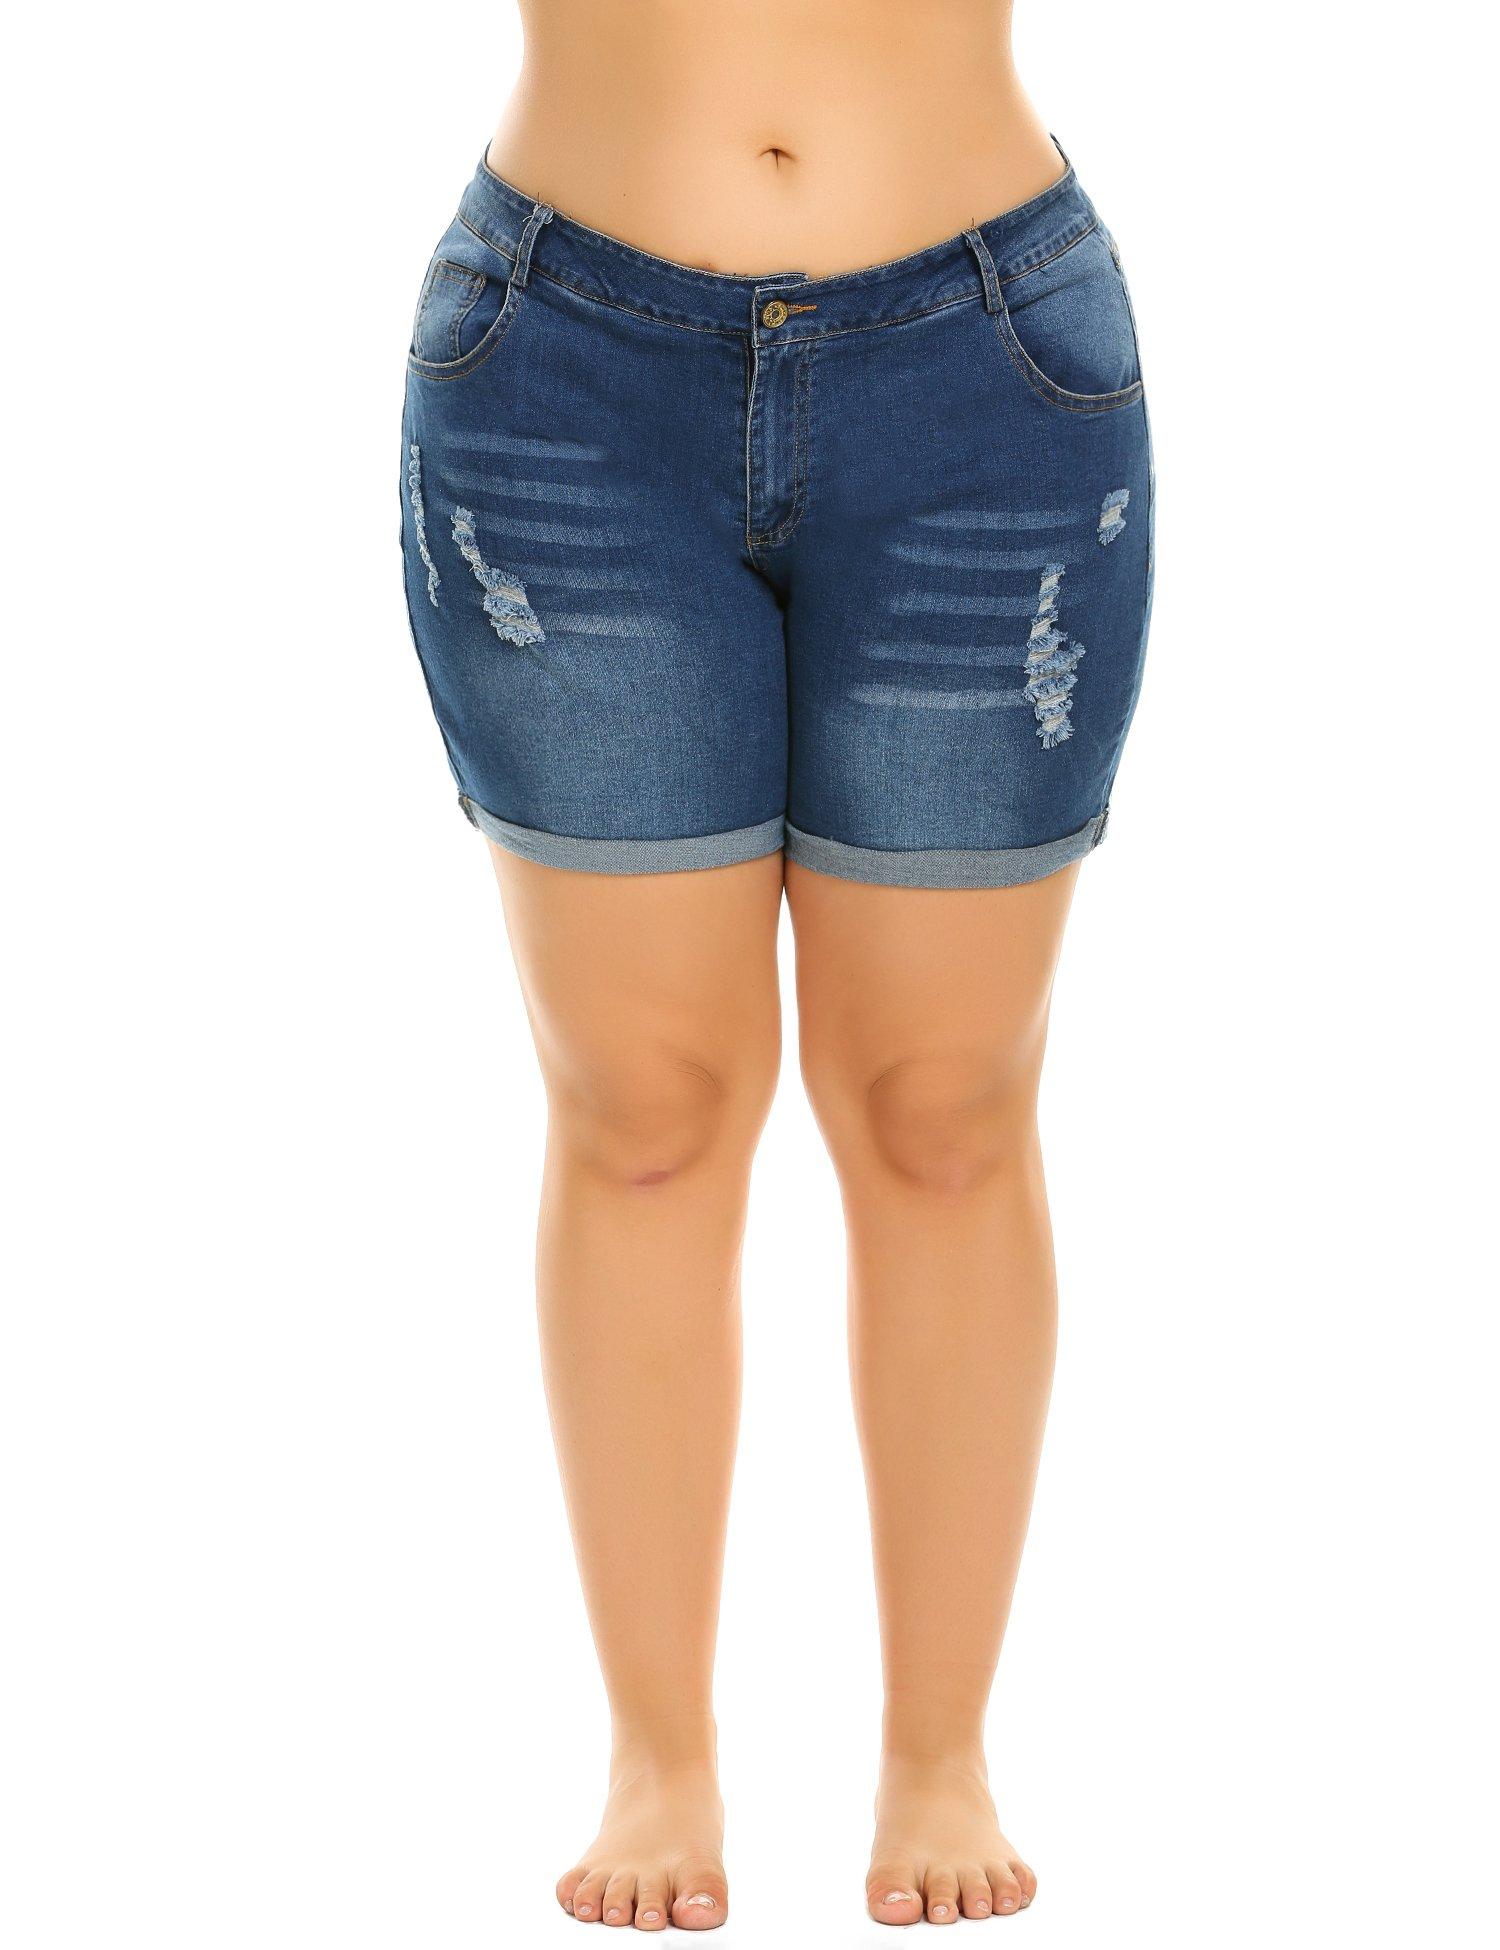 IN'VOLAND Women's Plus Size Denim Shorts Cuffed Short Jeans Pants